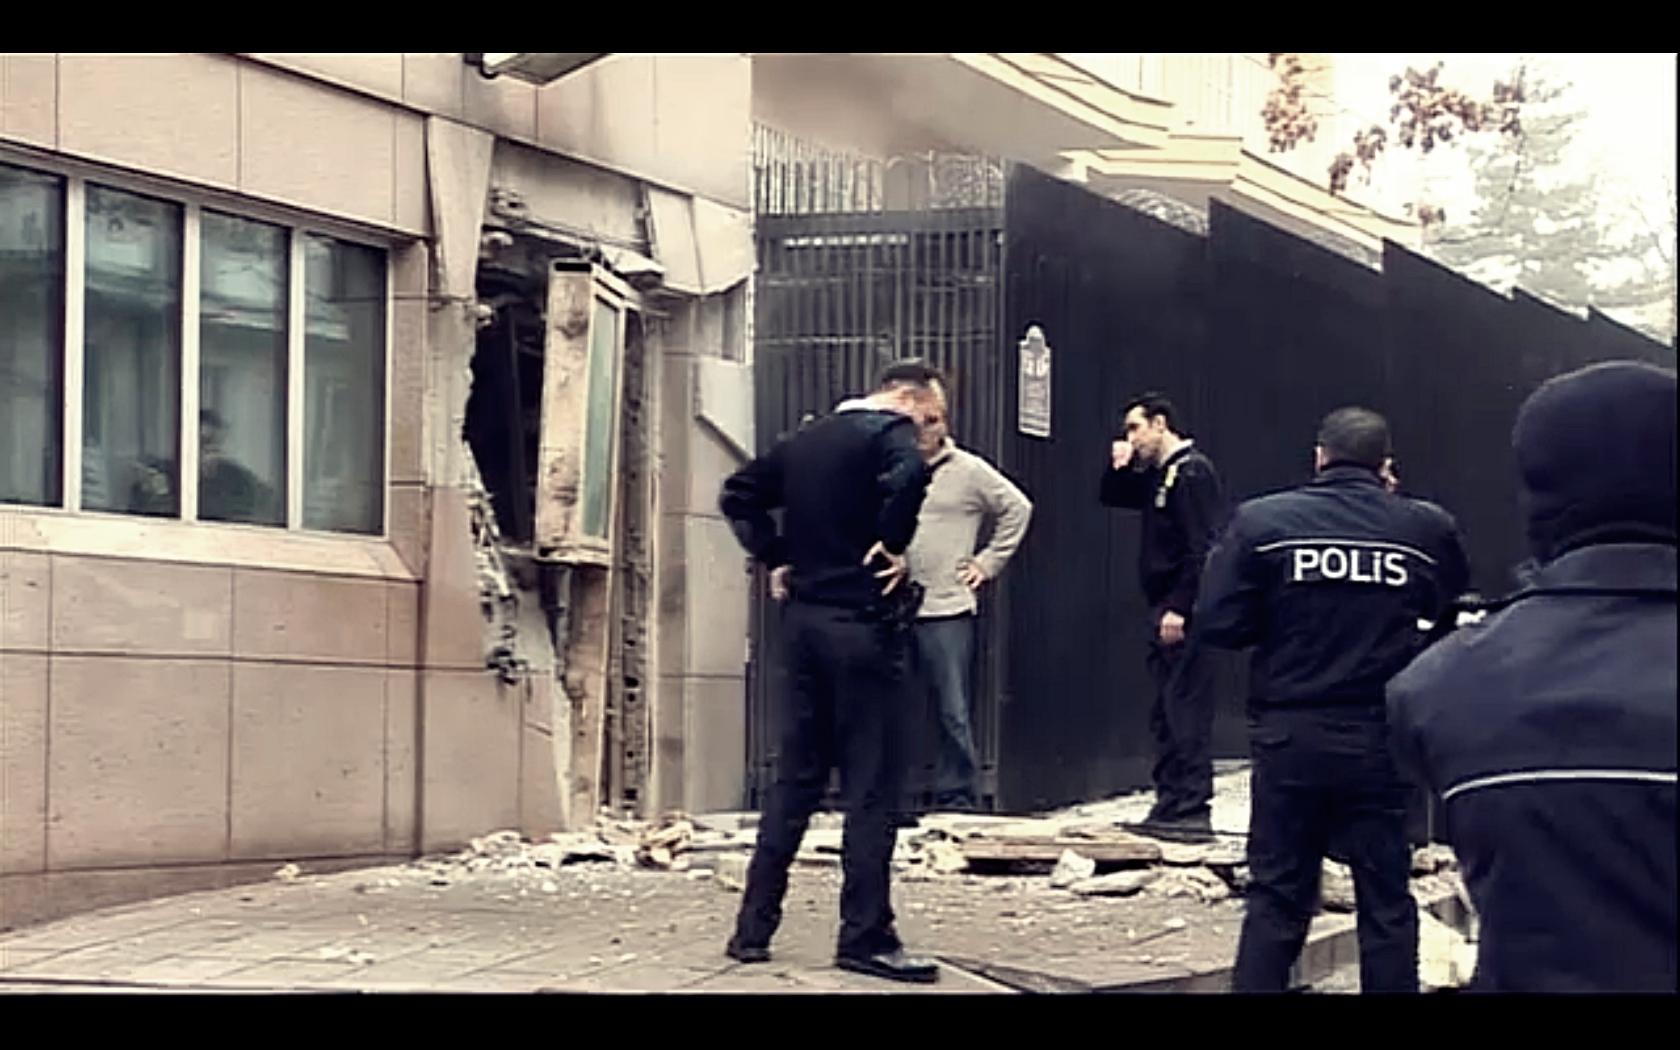 Atac sinucigas cu bomba in fata ambasadei SUA din Ankara. Doua persoane au murit